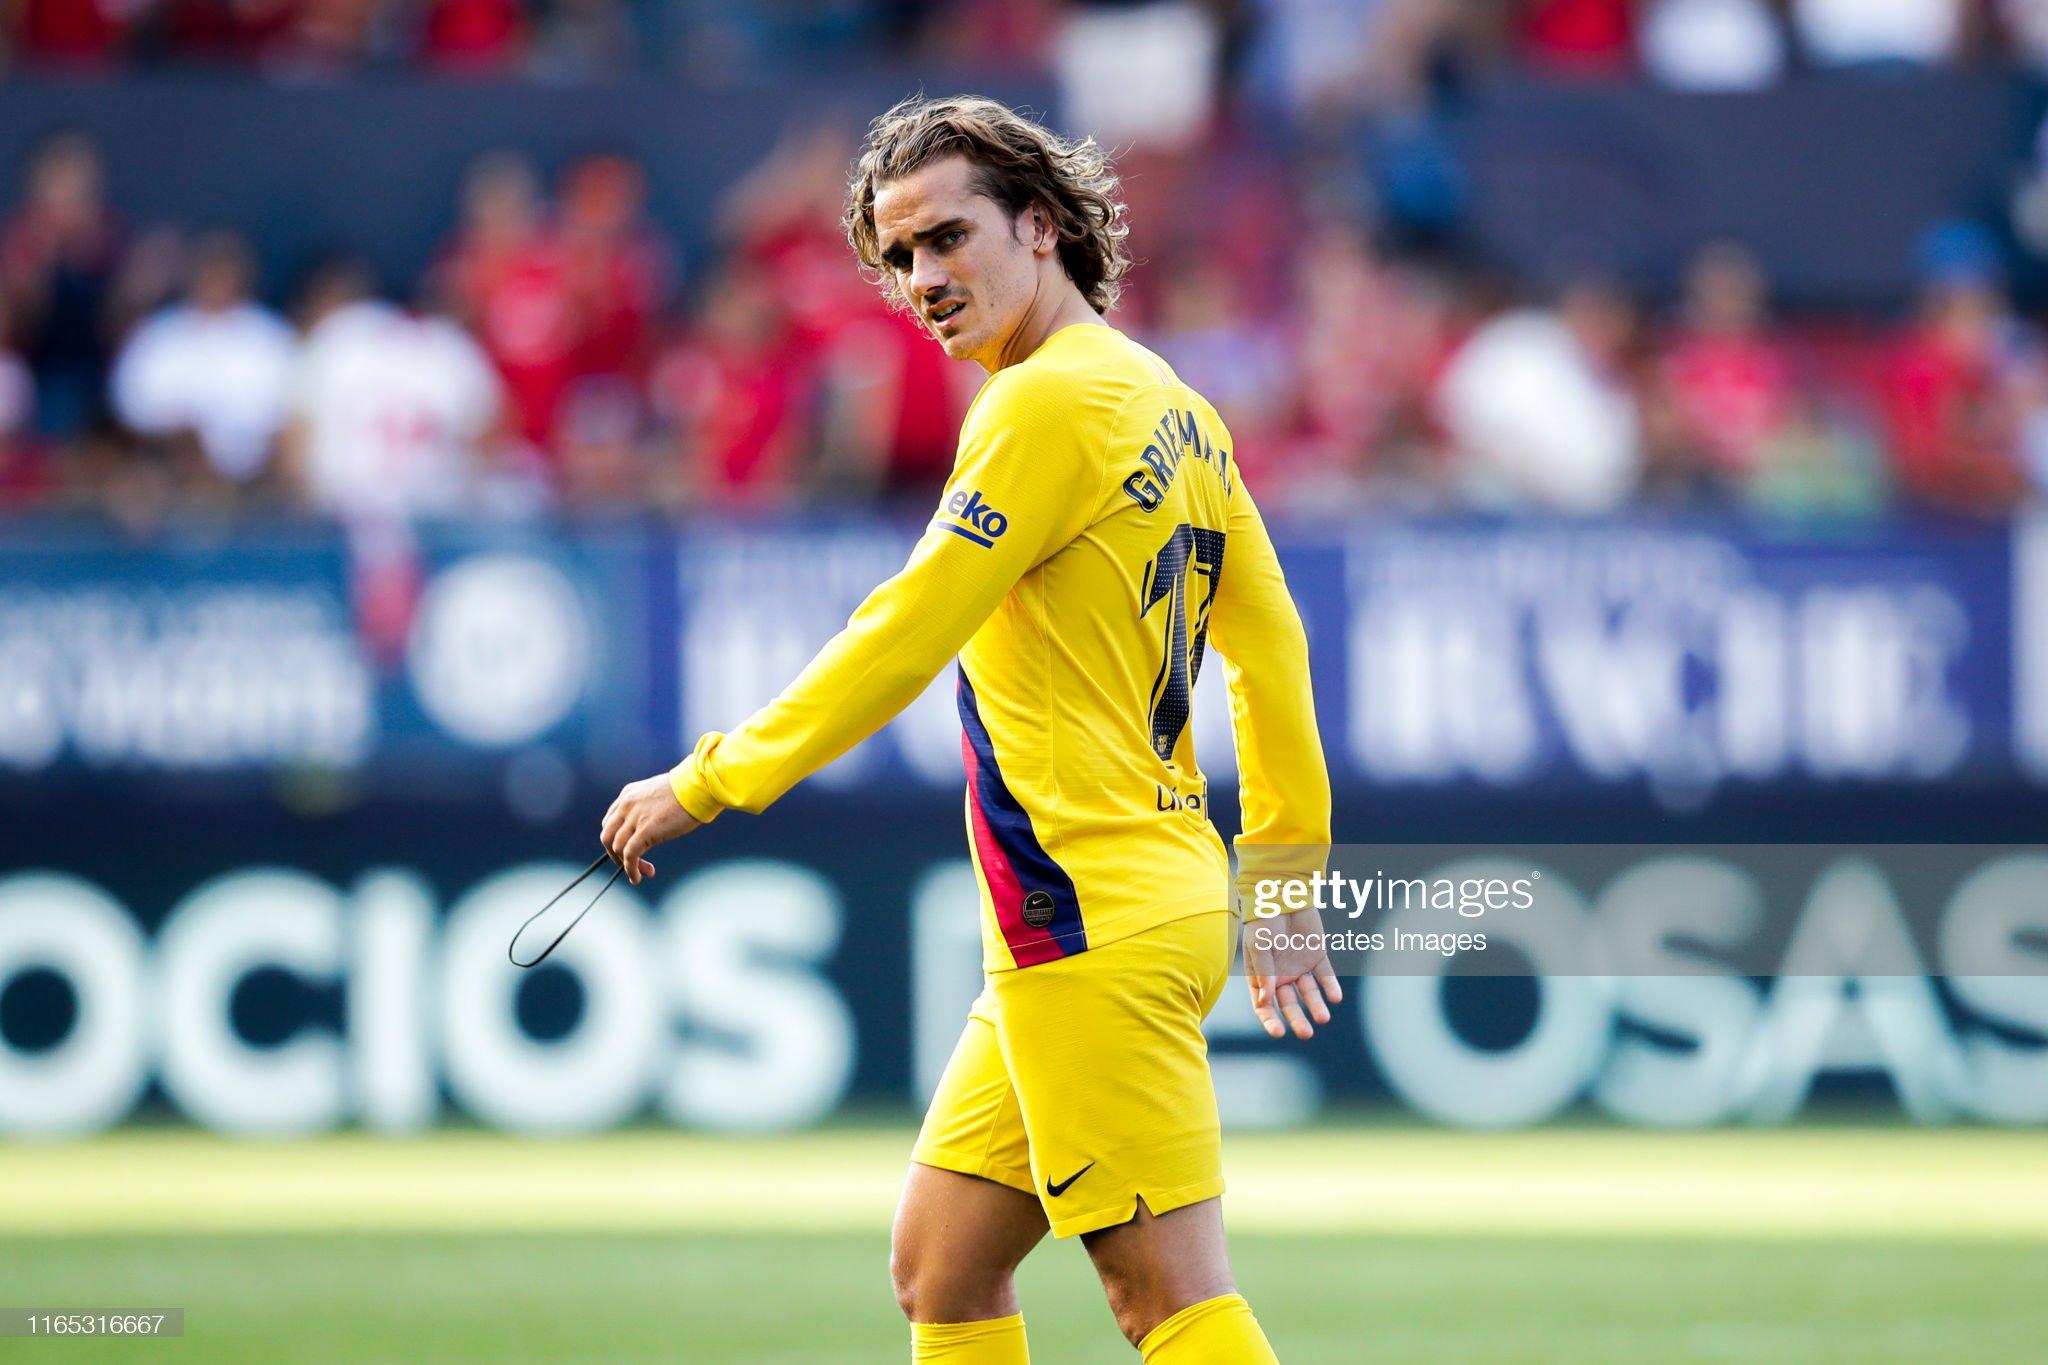 صور مباراة : أوساسونا - برشلونة 2-2 ( 31-08-2019 )  Antoine-griezmann-of-fc-barcelona-during-the-la-liga-santander-match-picture-id1165316667?s=2048x2048